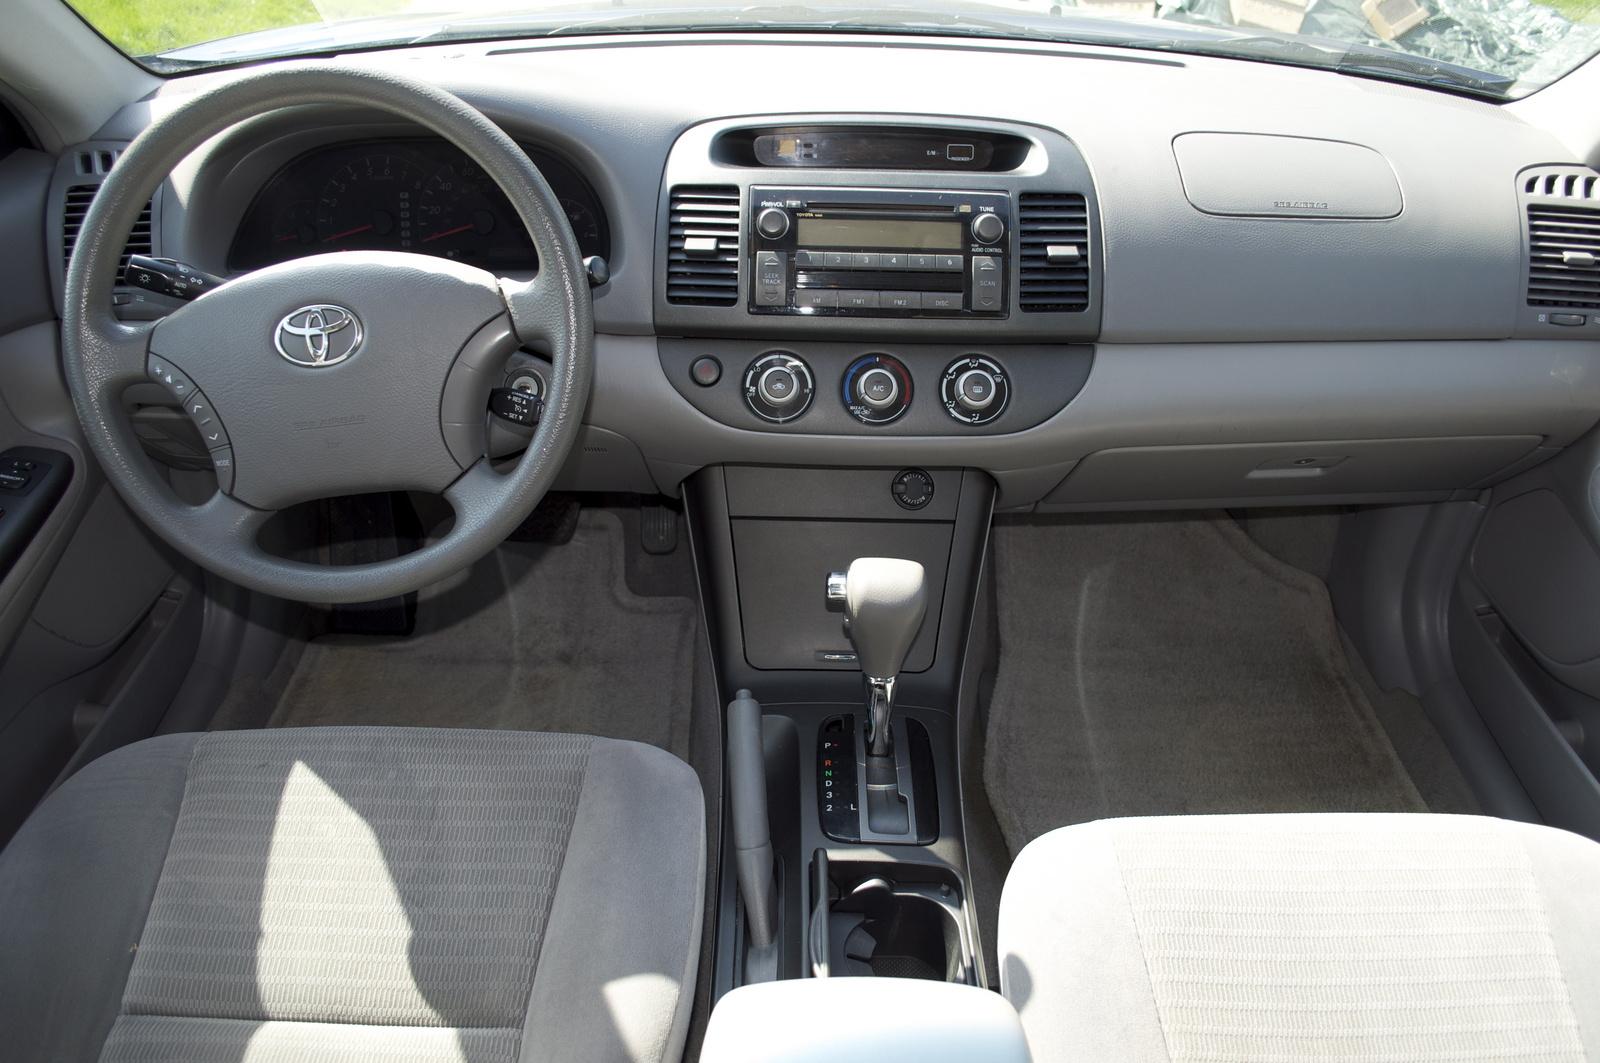 2006 Toyota Camry #17 Toyota Camry #17